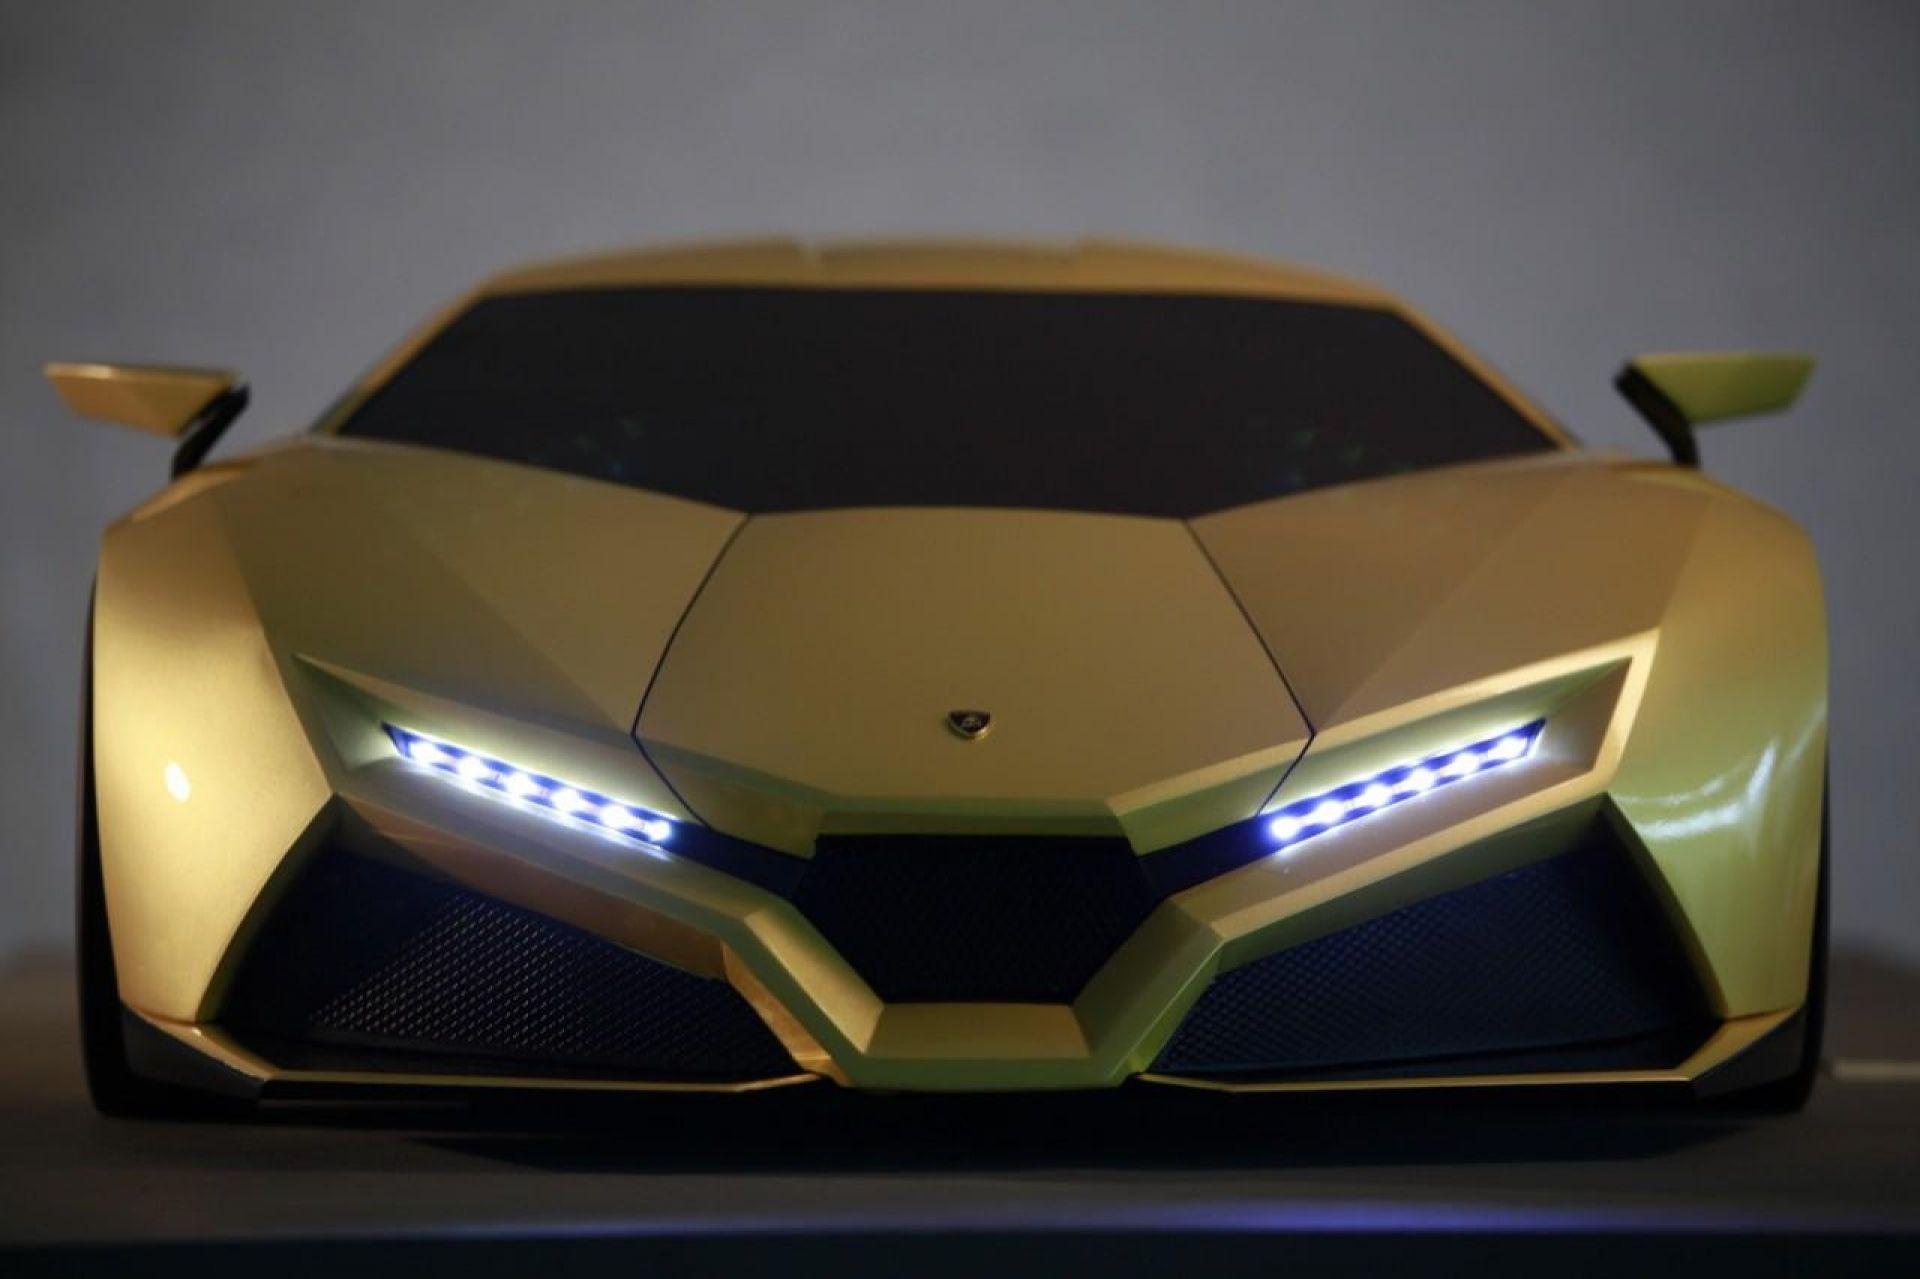 online projects gallery concept autodesk super car lamborghini cars